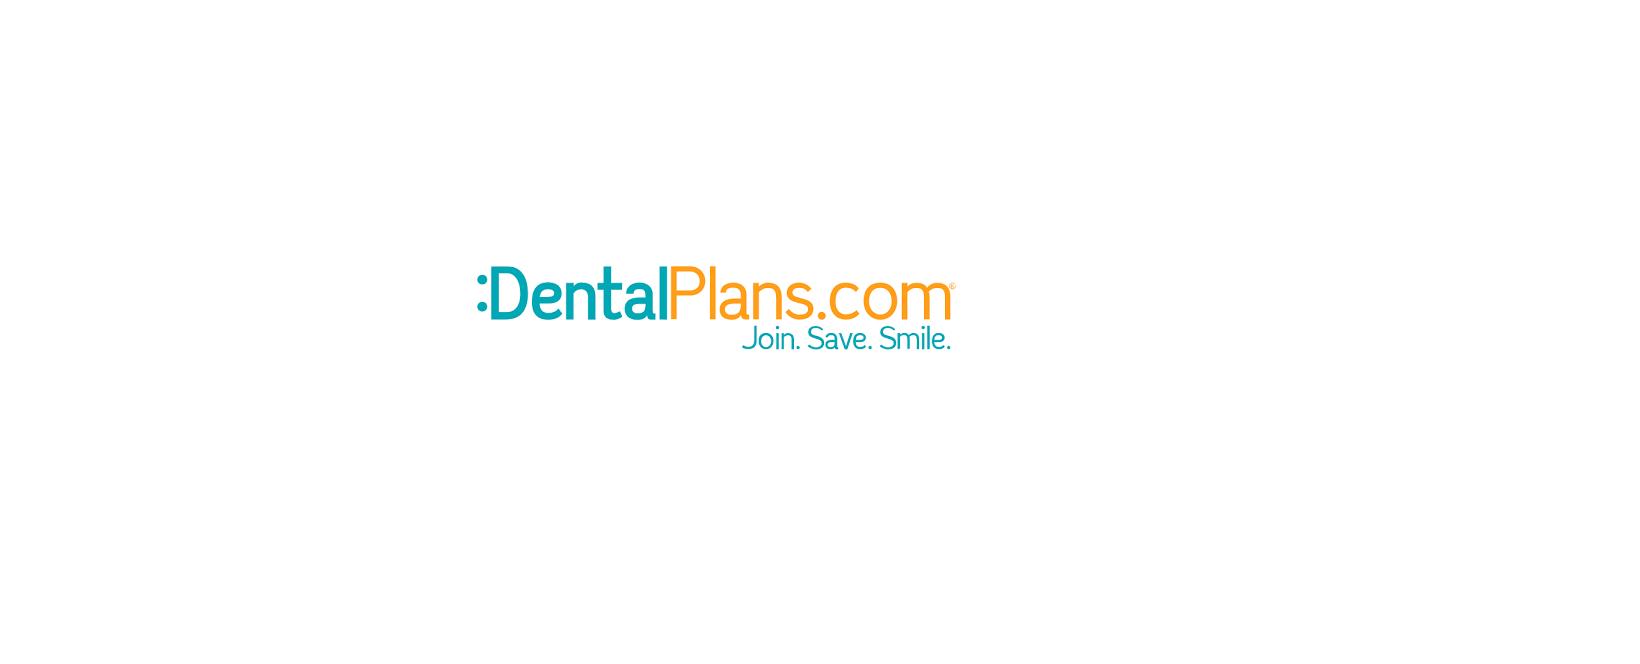 DentalPlans Discount Code 2021